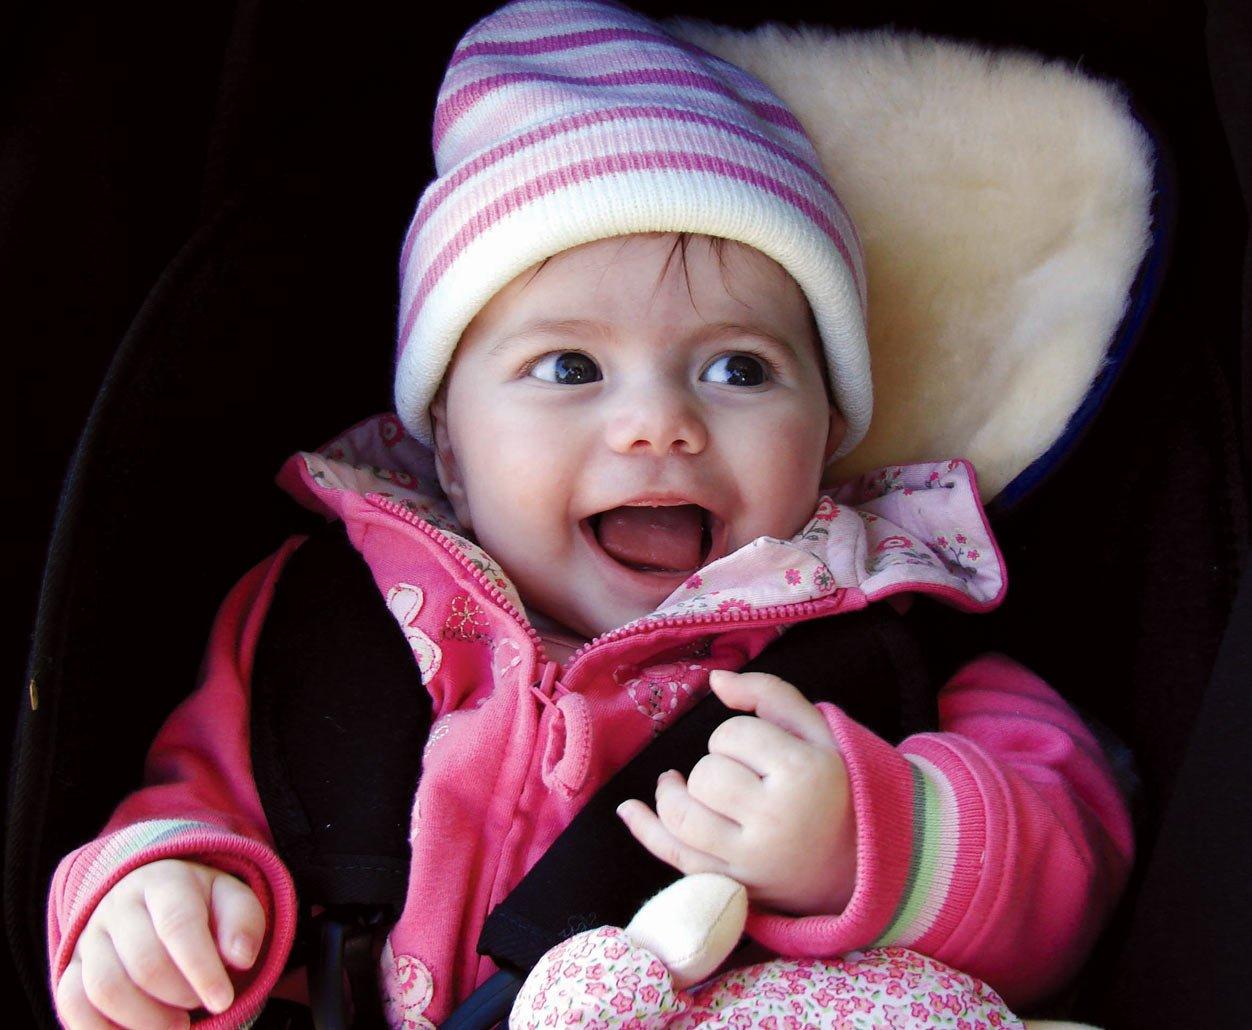 MIOSWSFN Bowron Baby Stroller Lambskin Fleece